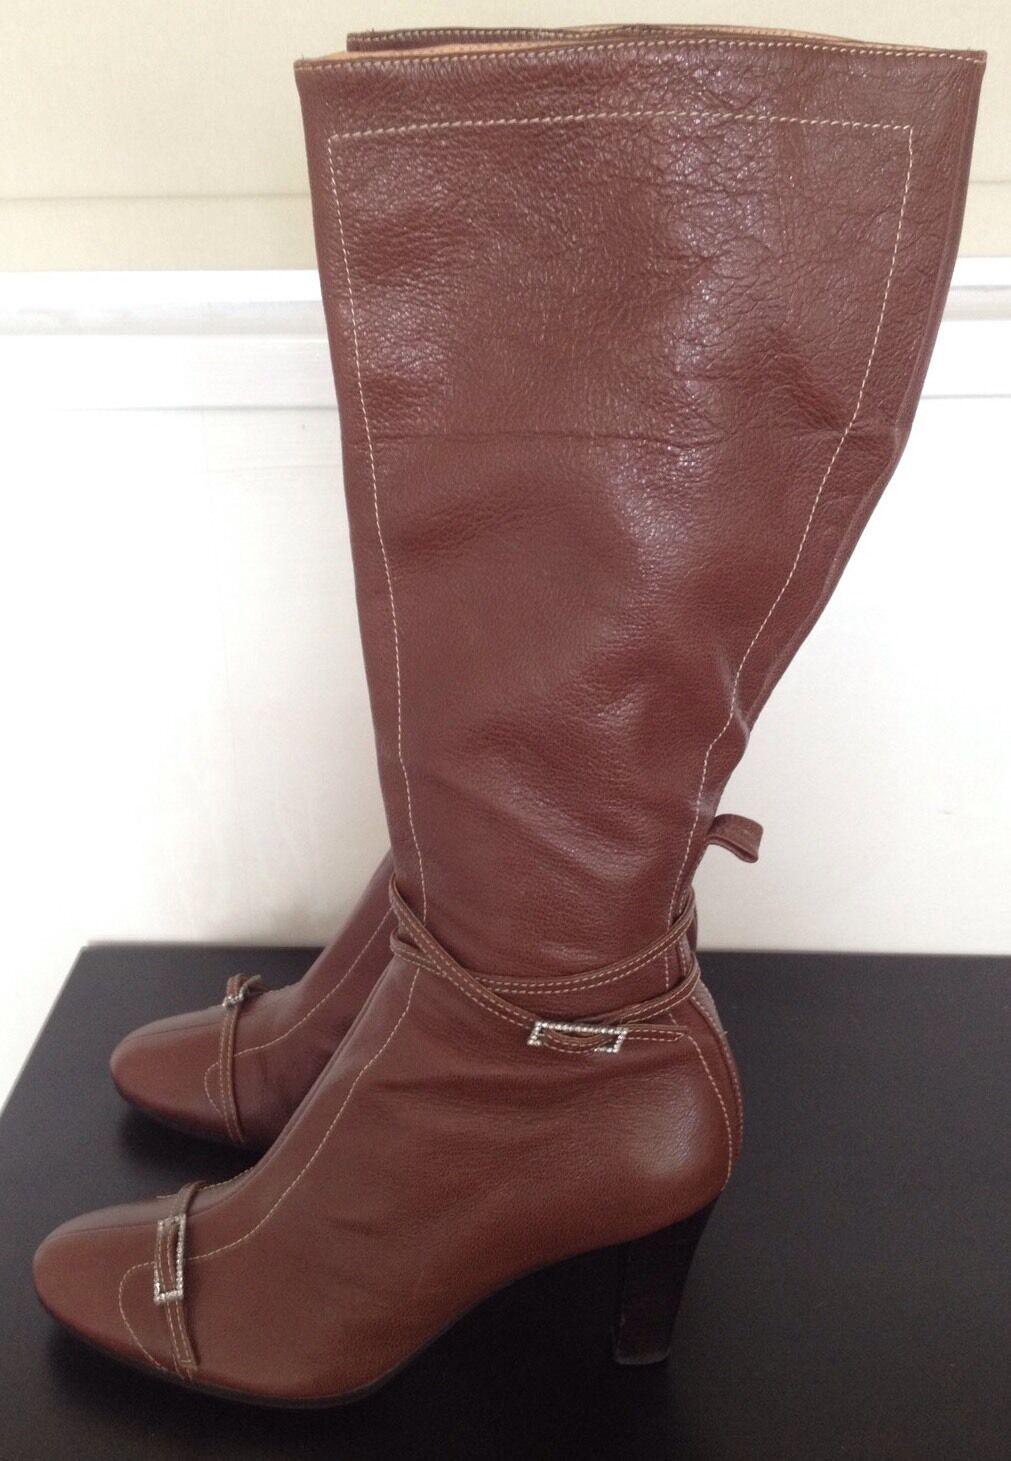 Moda Italia Brown Soft Leather Knee High Boots Heel Diamante Buckle Zip UK 7